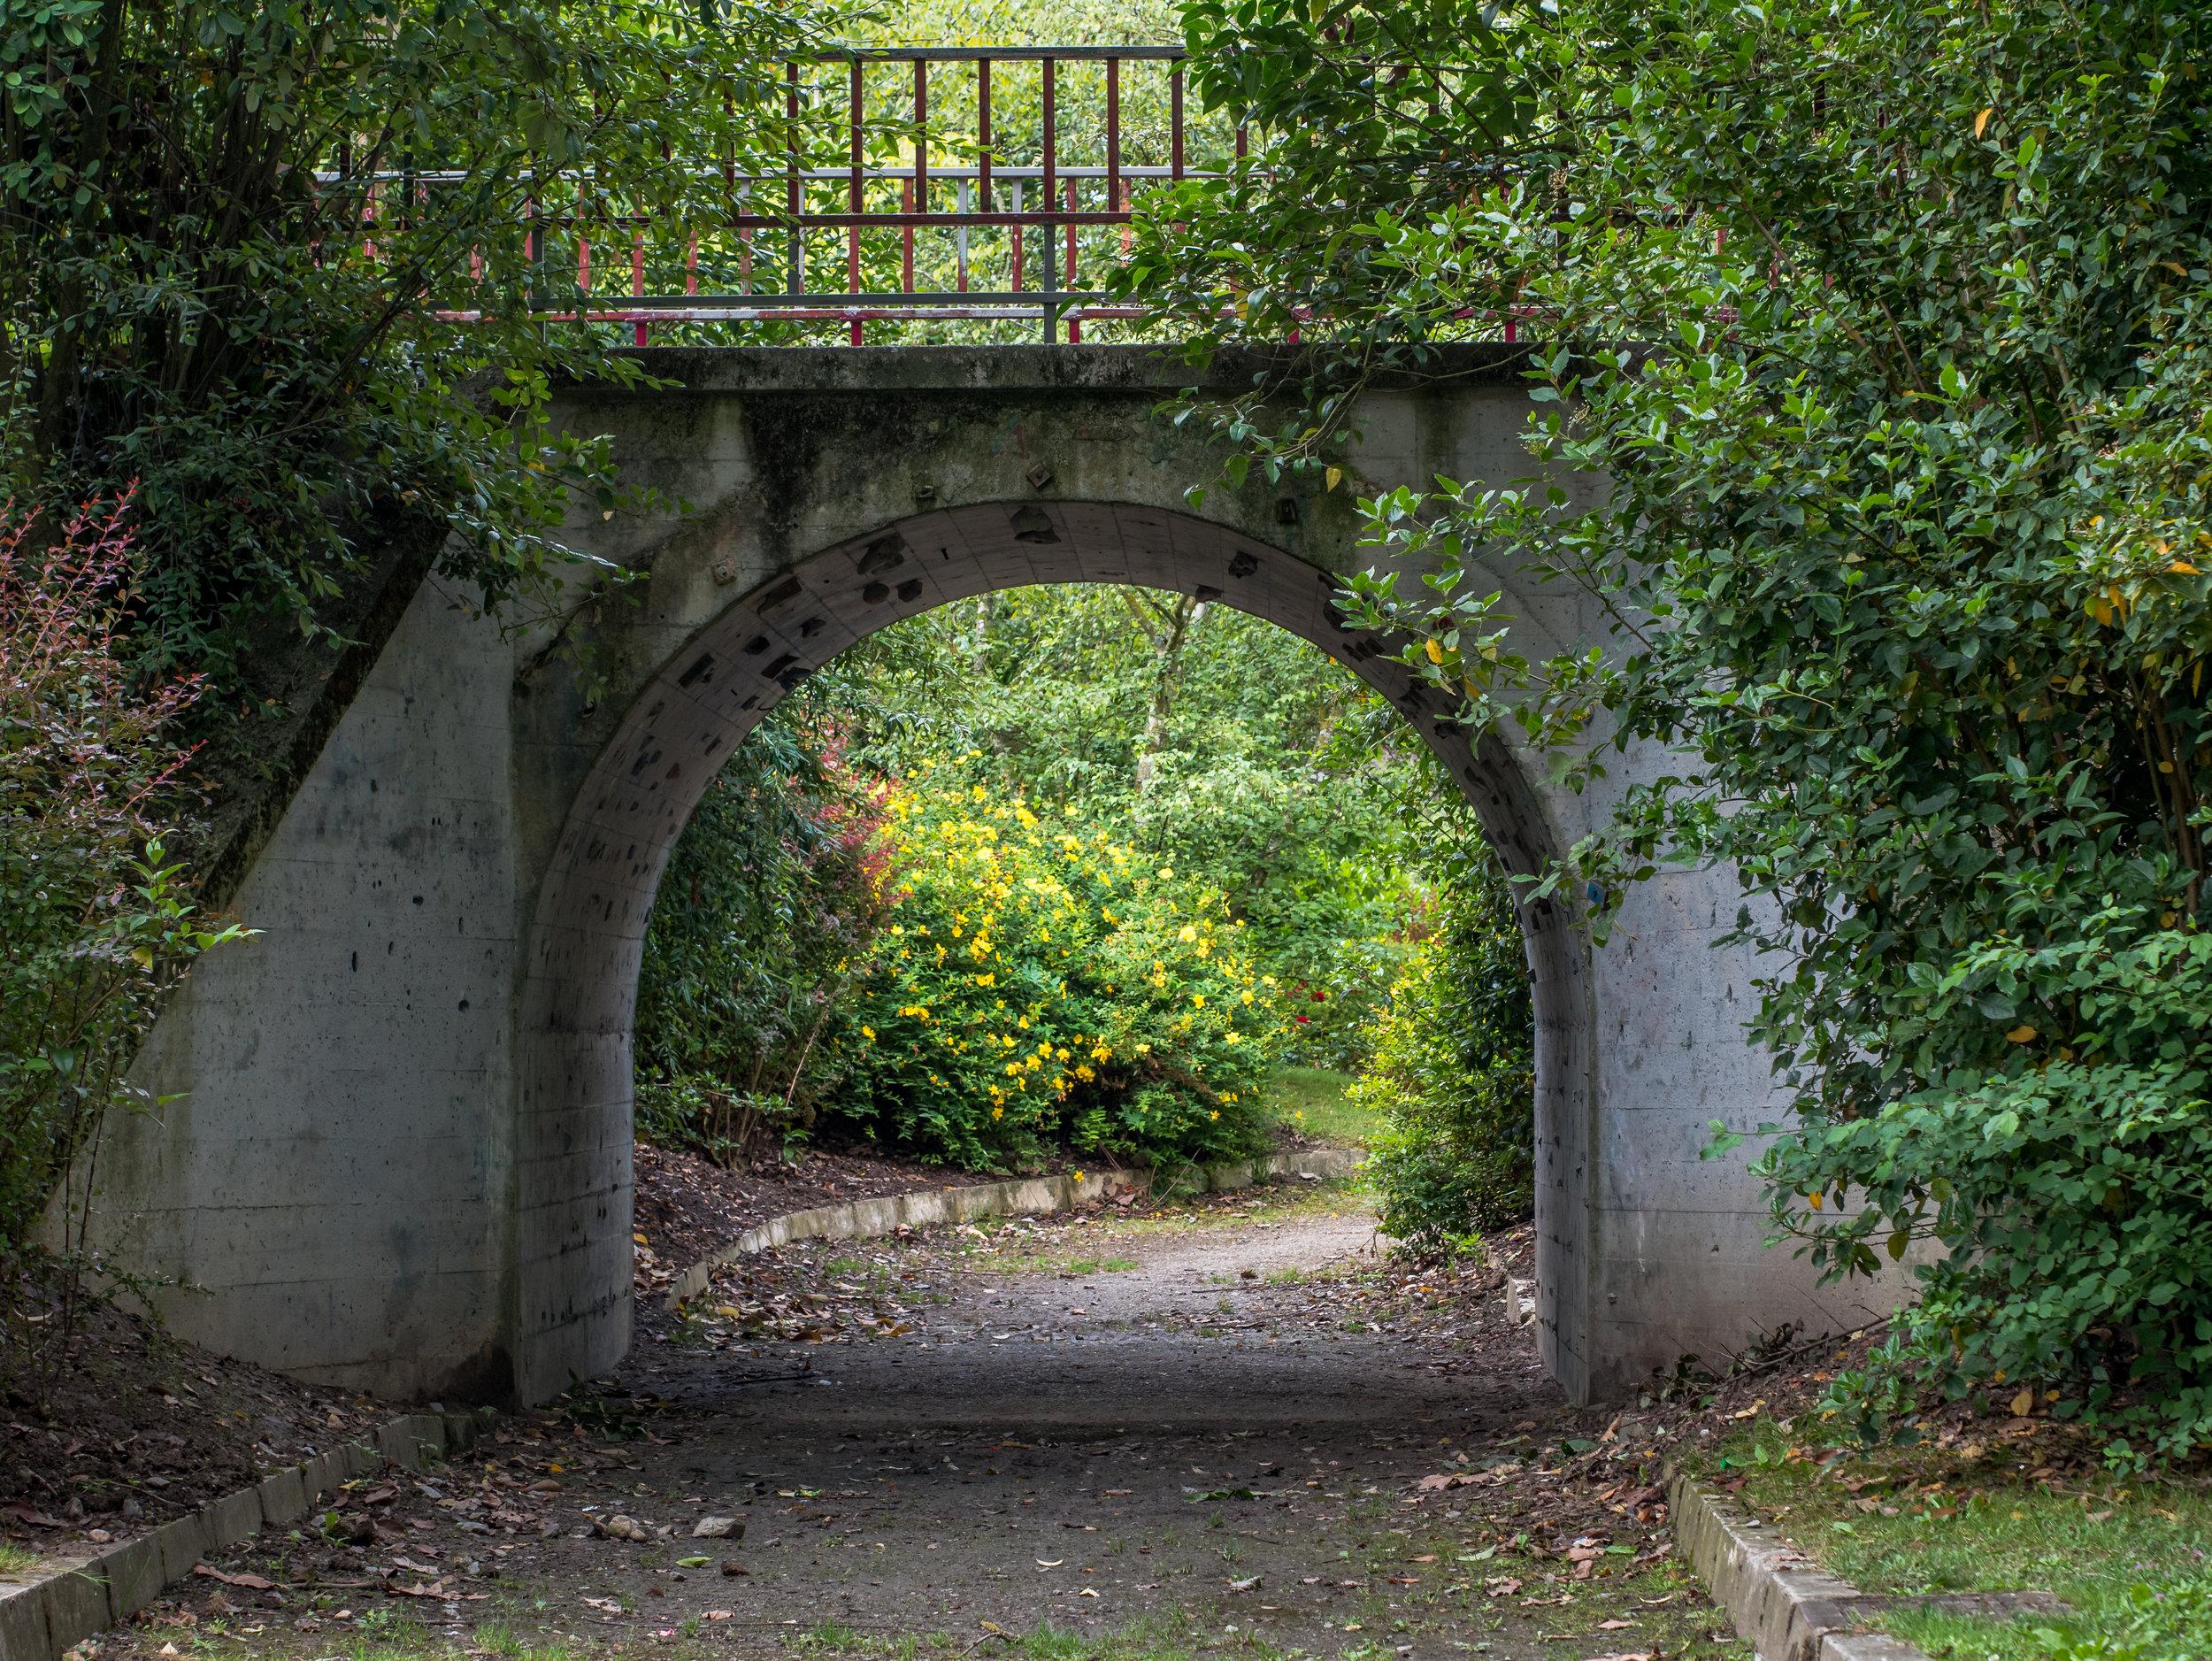 Vitoria_-_Parque_de_Arriaga_-_Puente_02.jpg